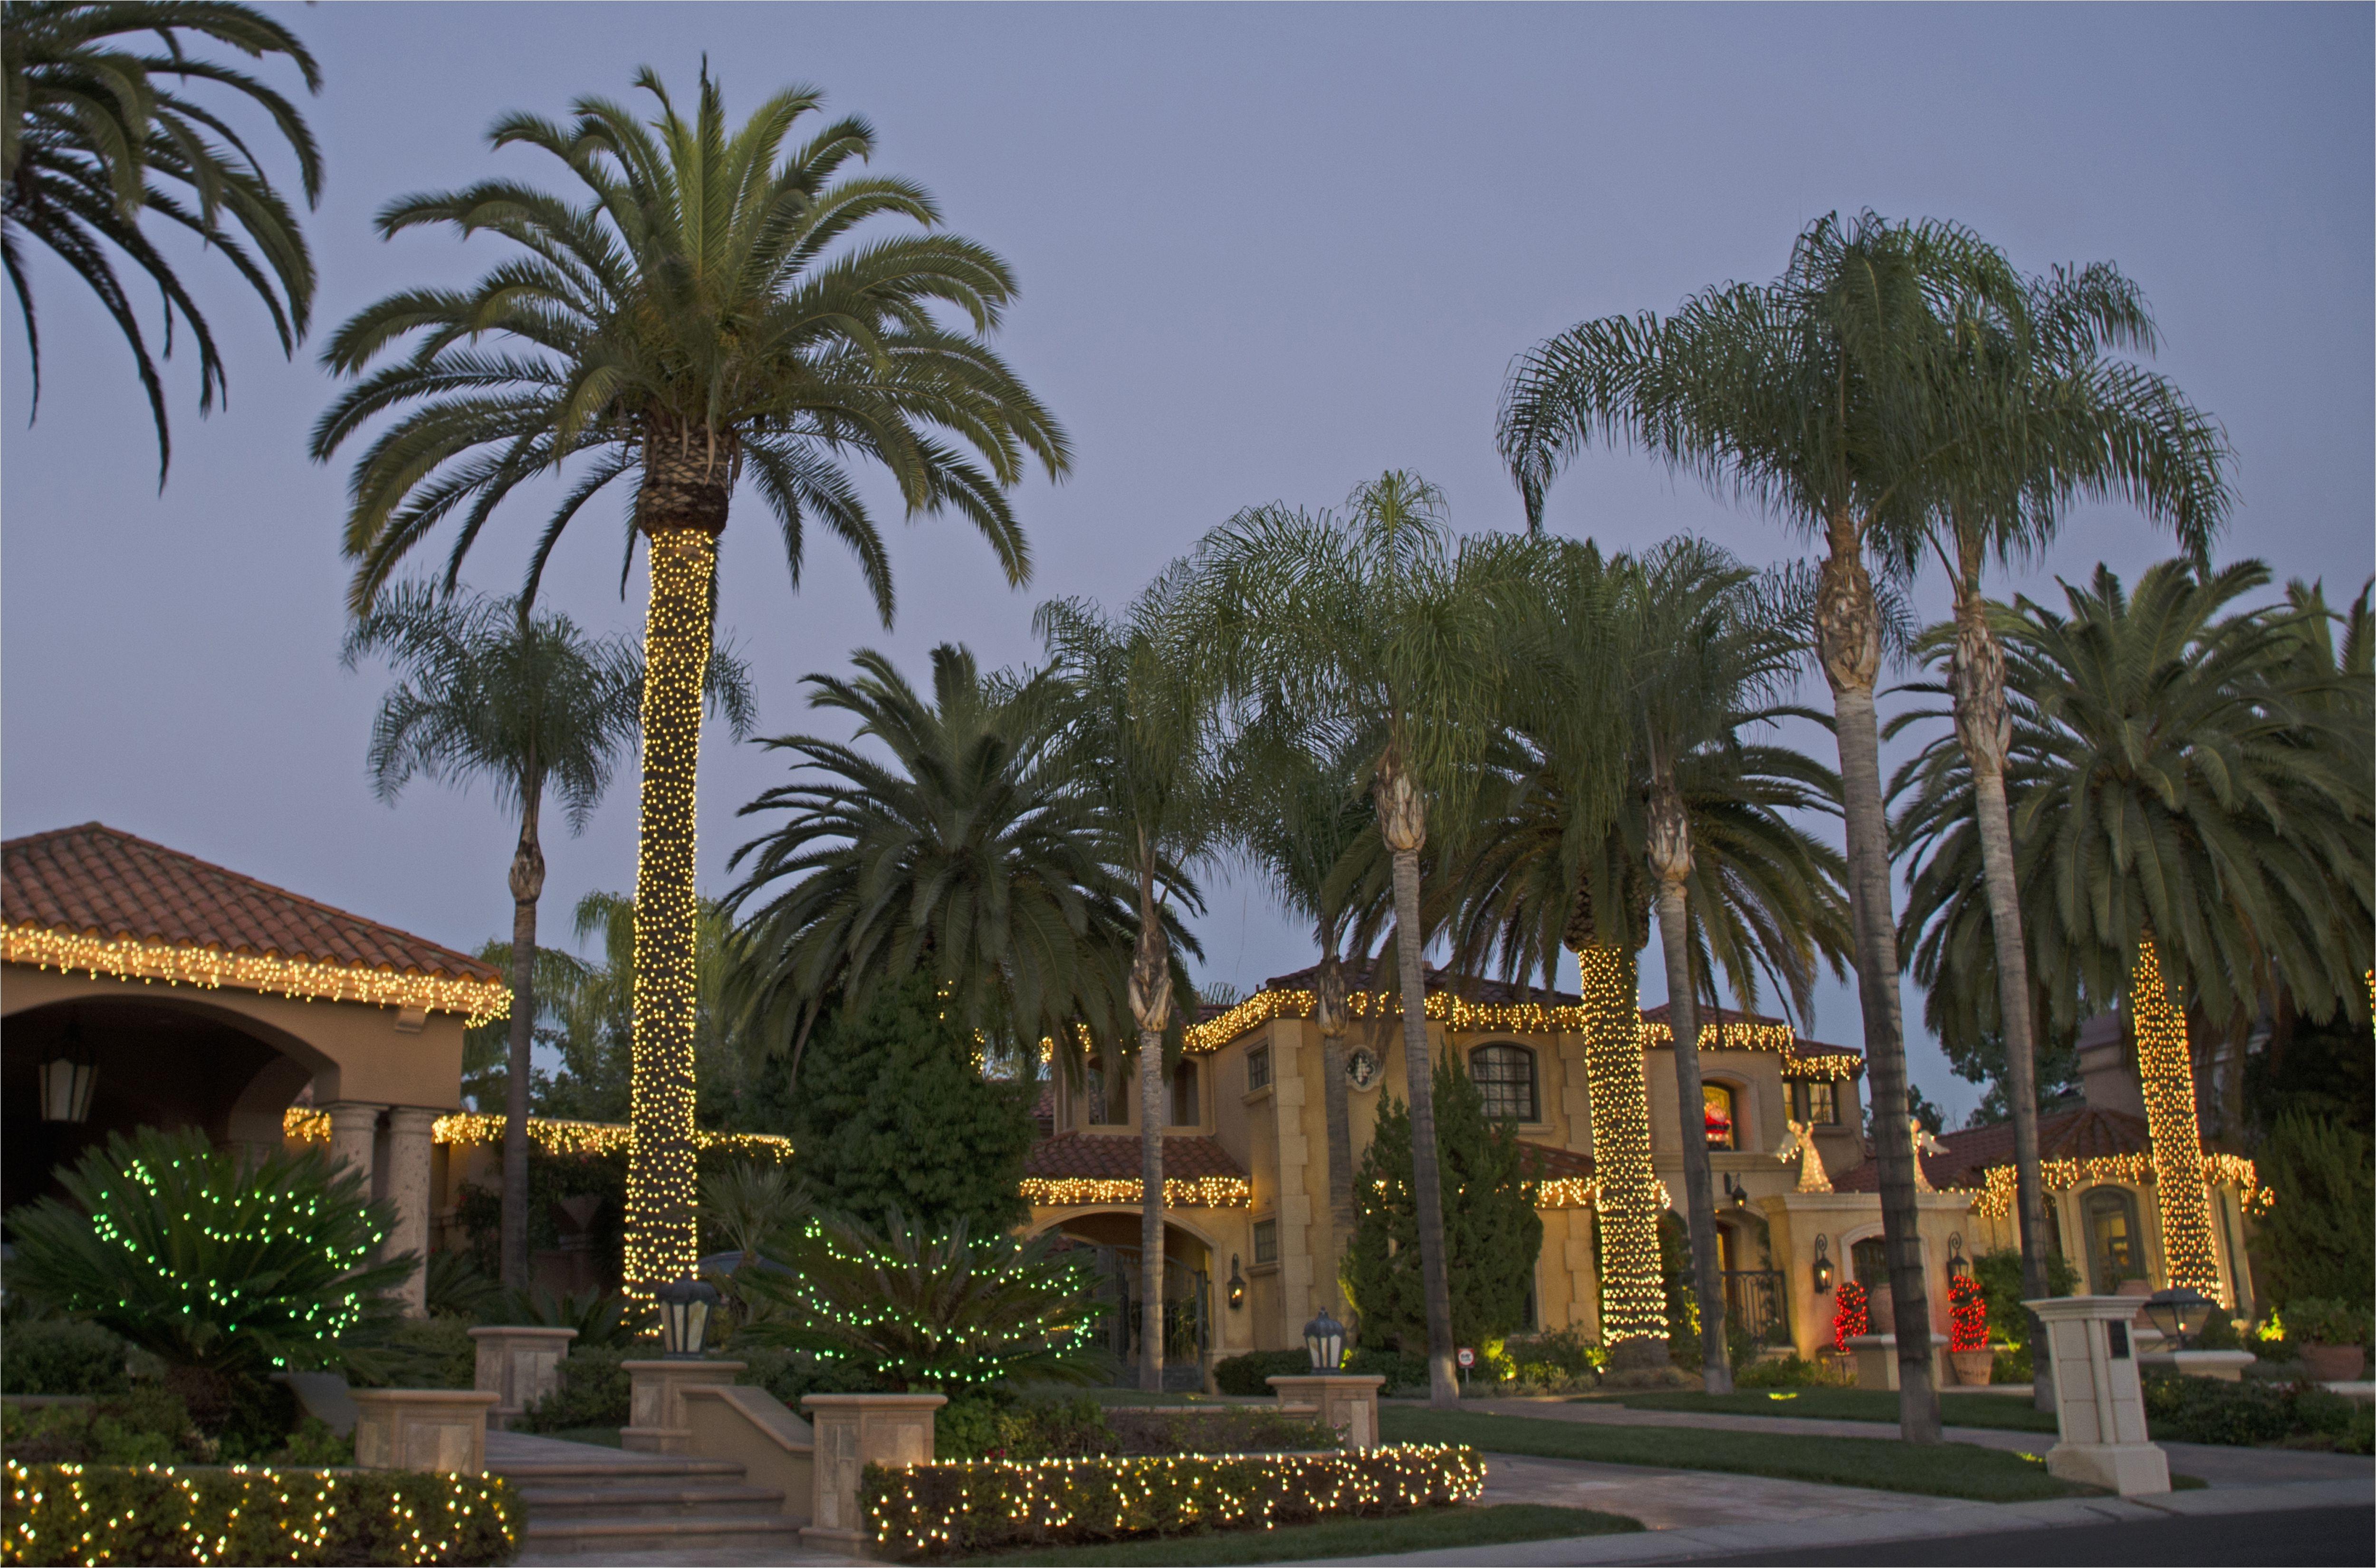 lit palm trees big 57e422285f9b586c359a45f3